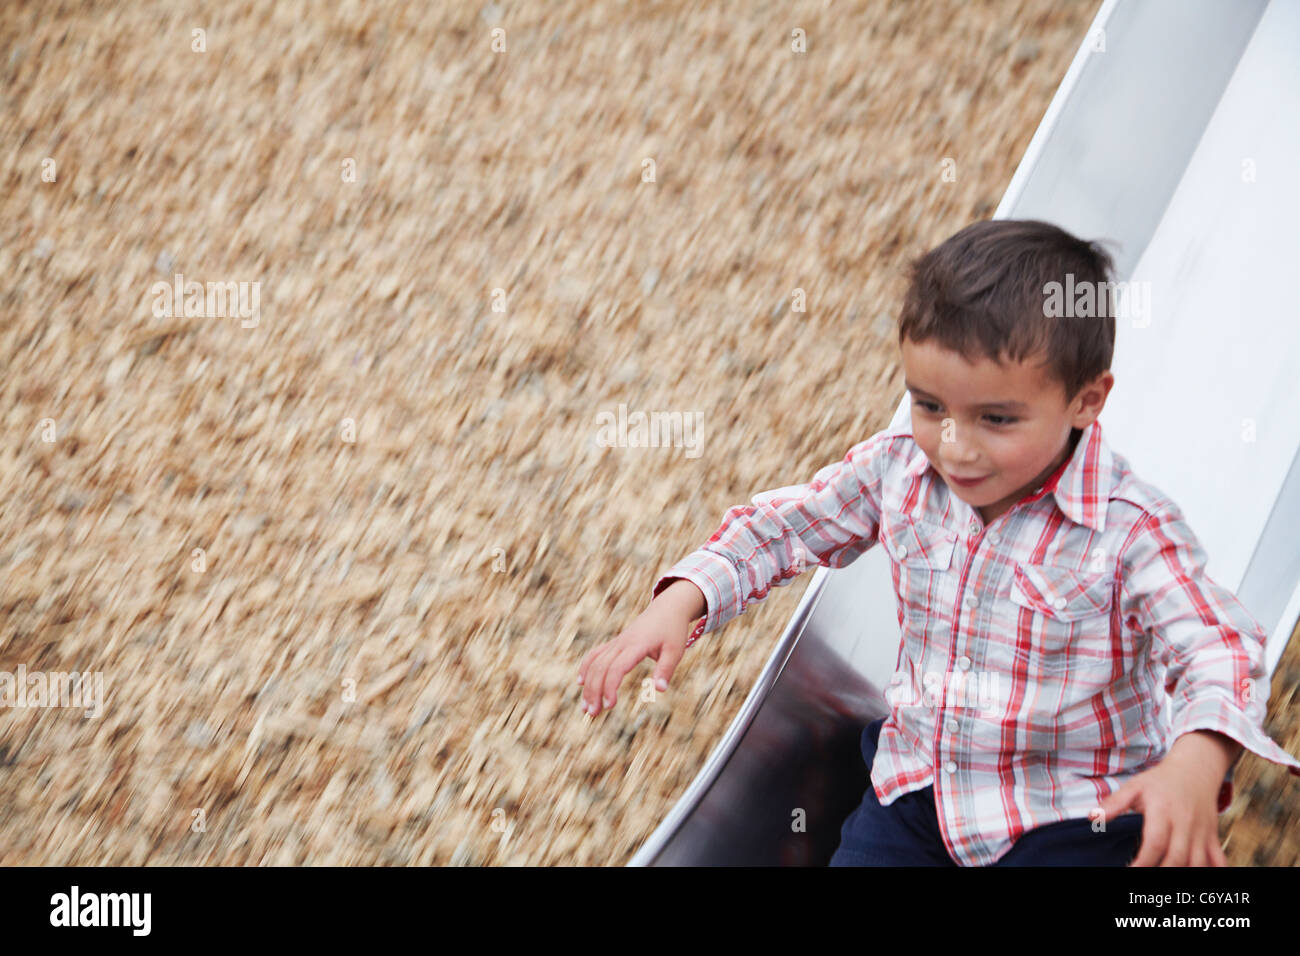 Boy playing on slide at playground - Stock Image